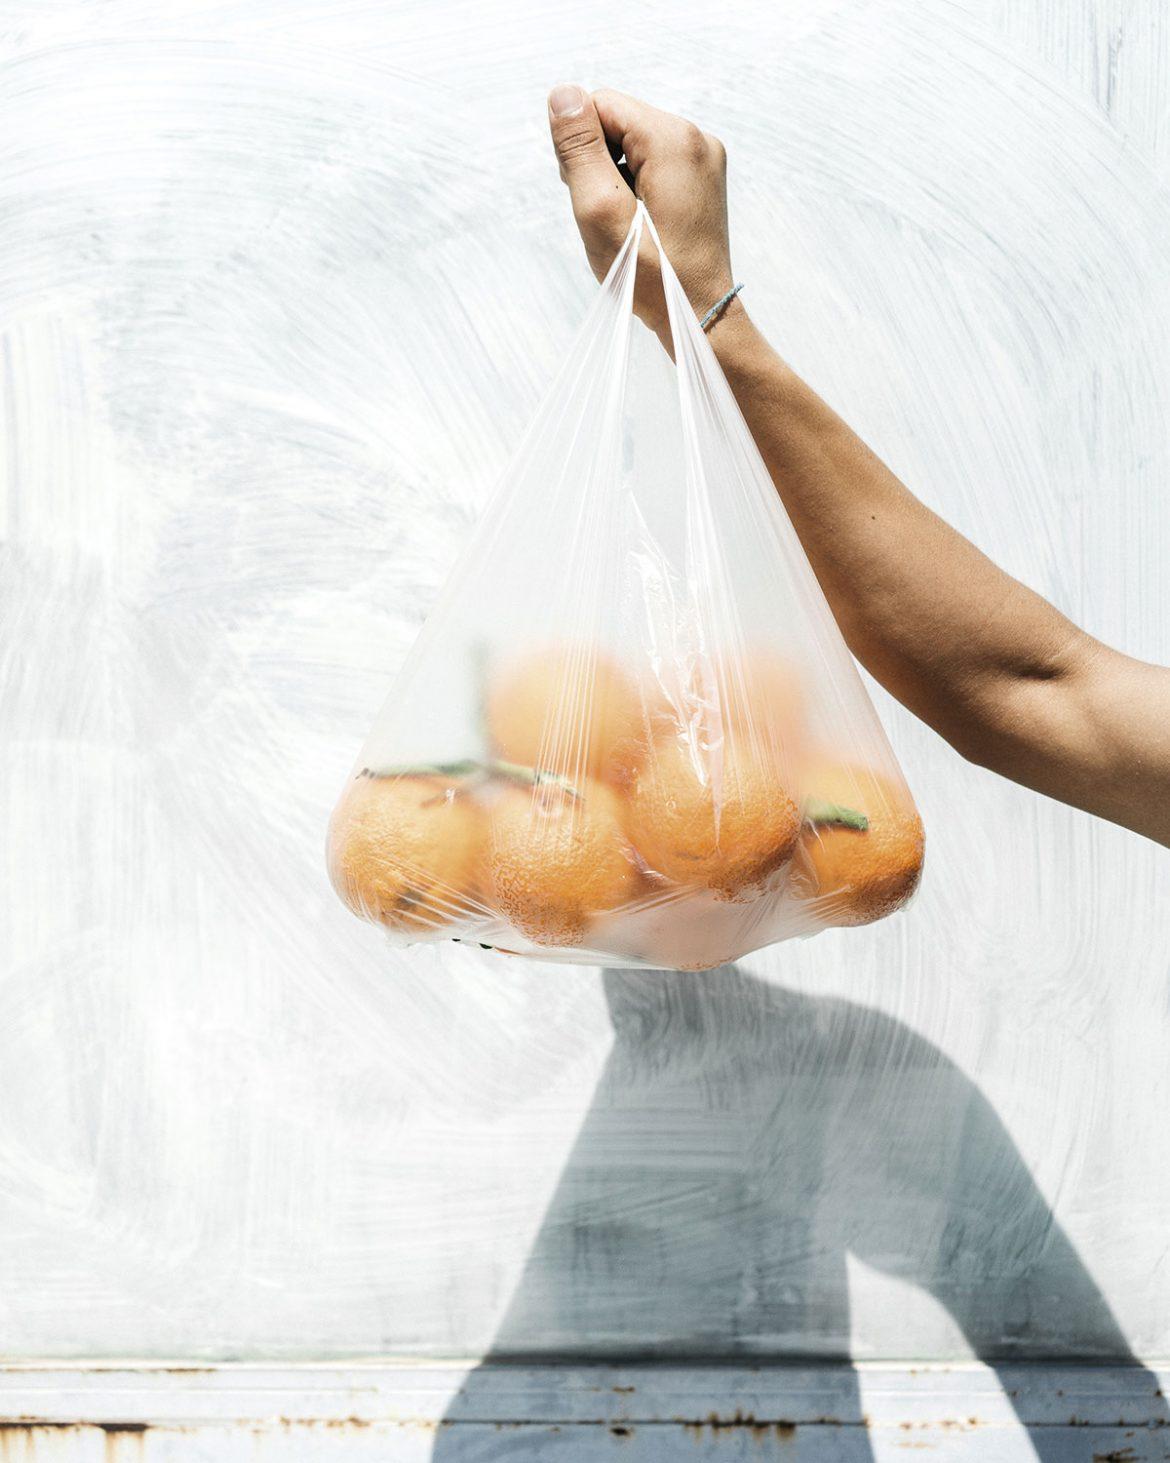 Fra Hilde Honeruds fotobok «Gym».